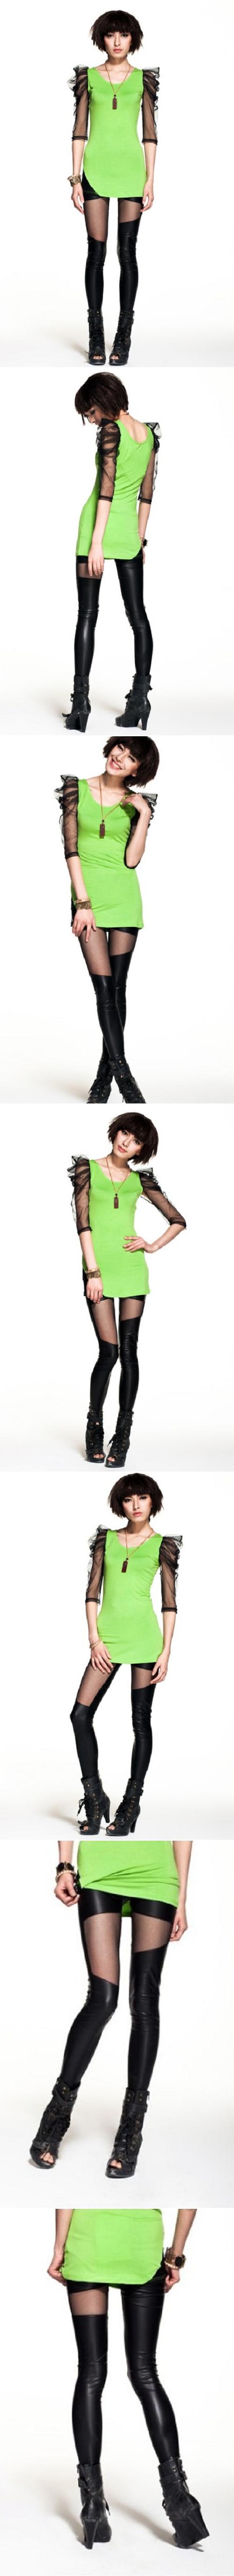 Asymmetric Sheer Mesh Stretchy Faux Leather Leggings Legwear Tights Pants 9355   eBay